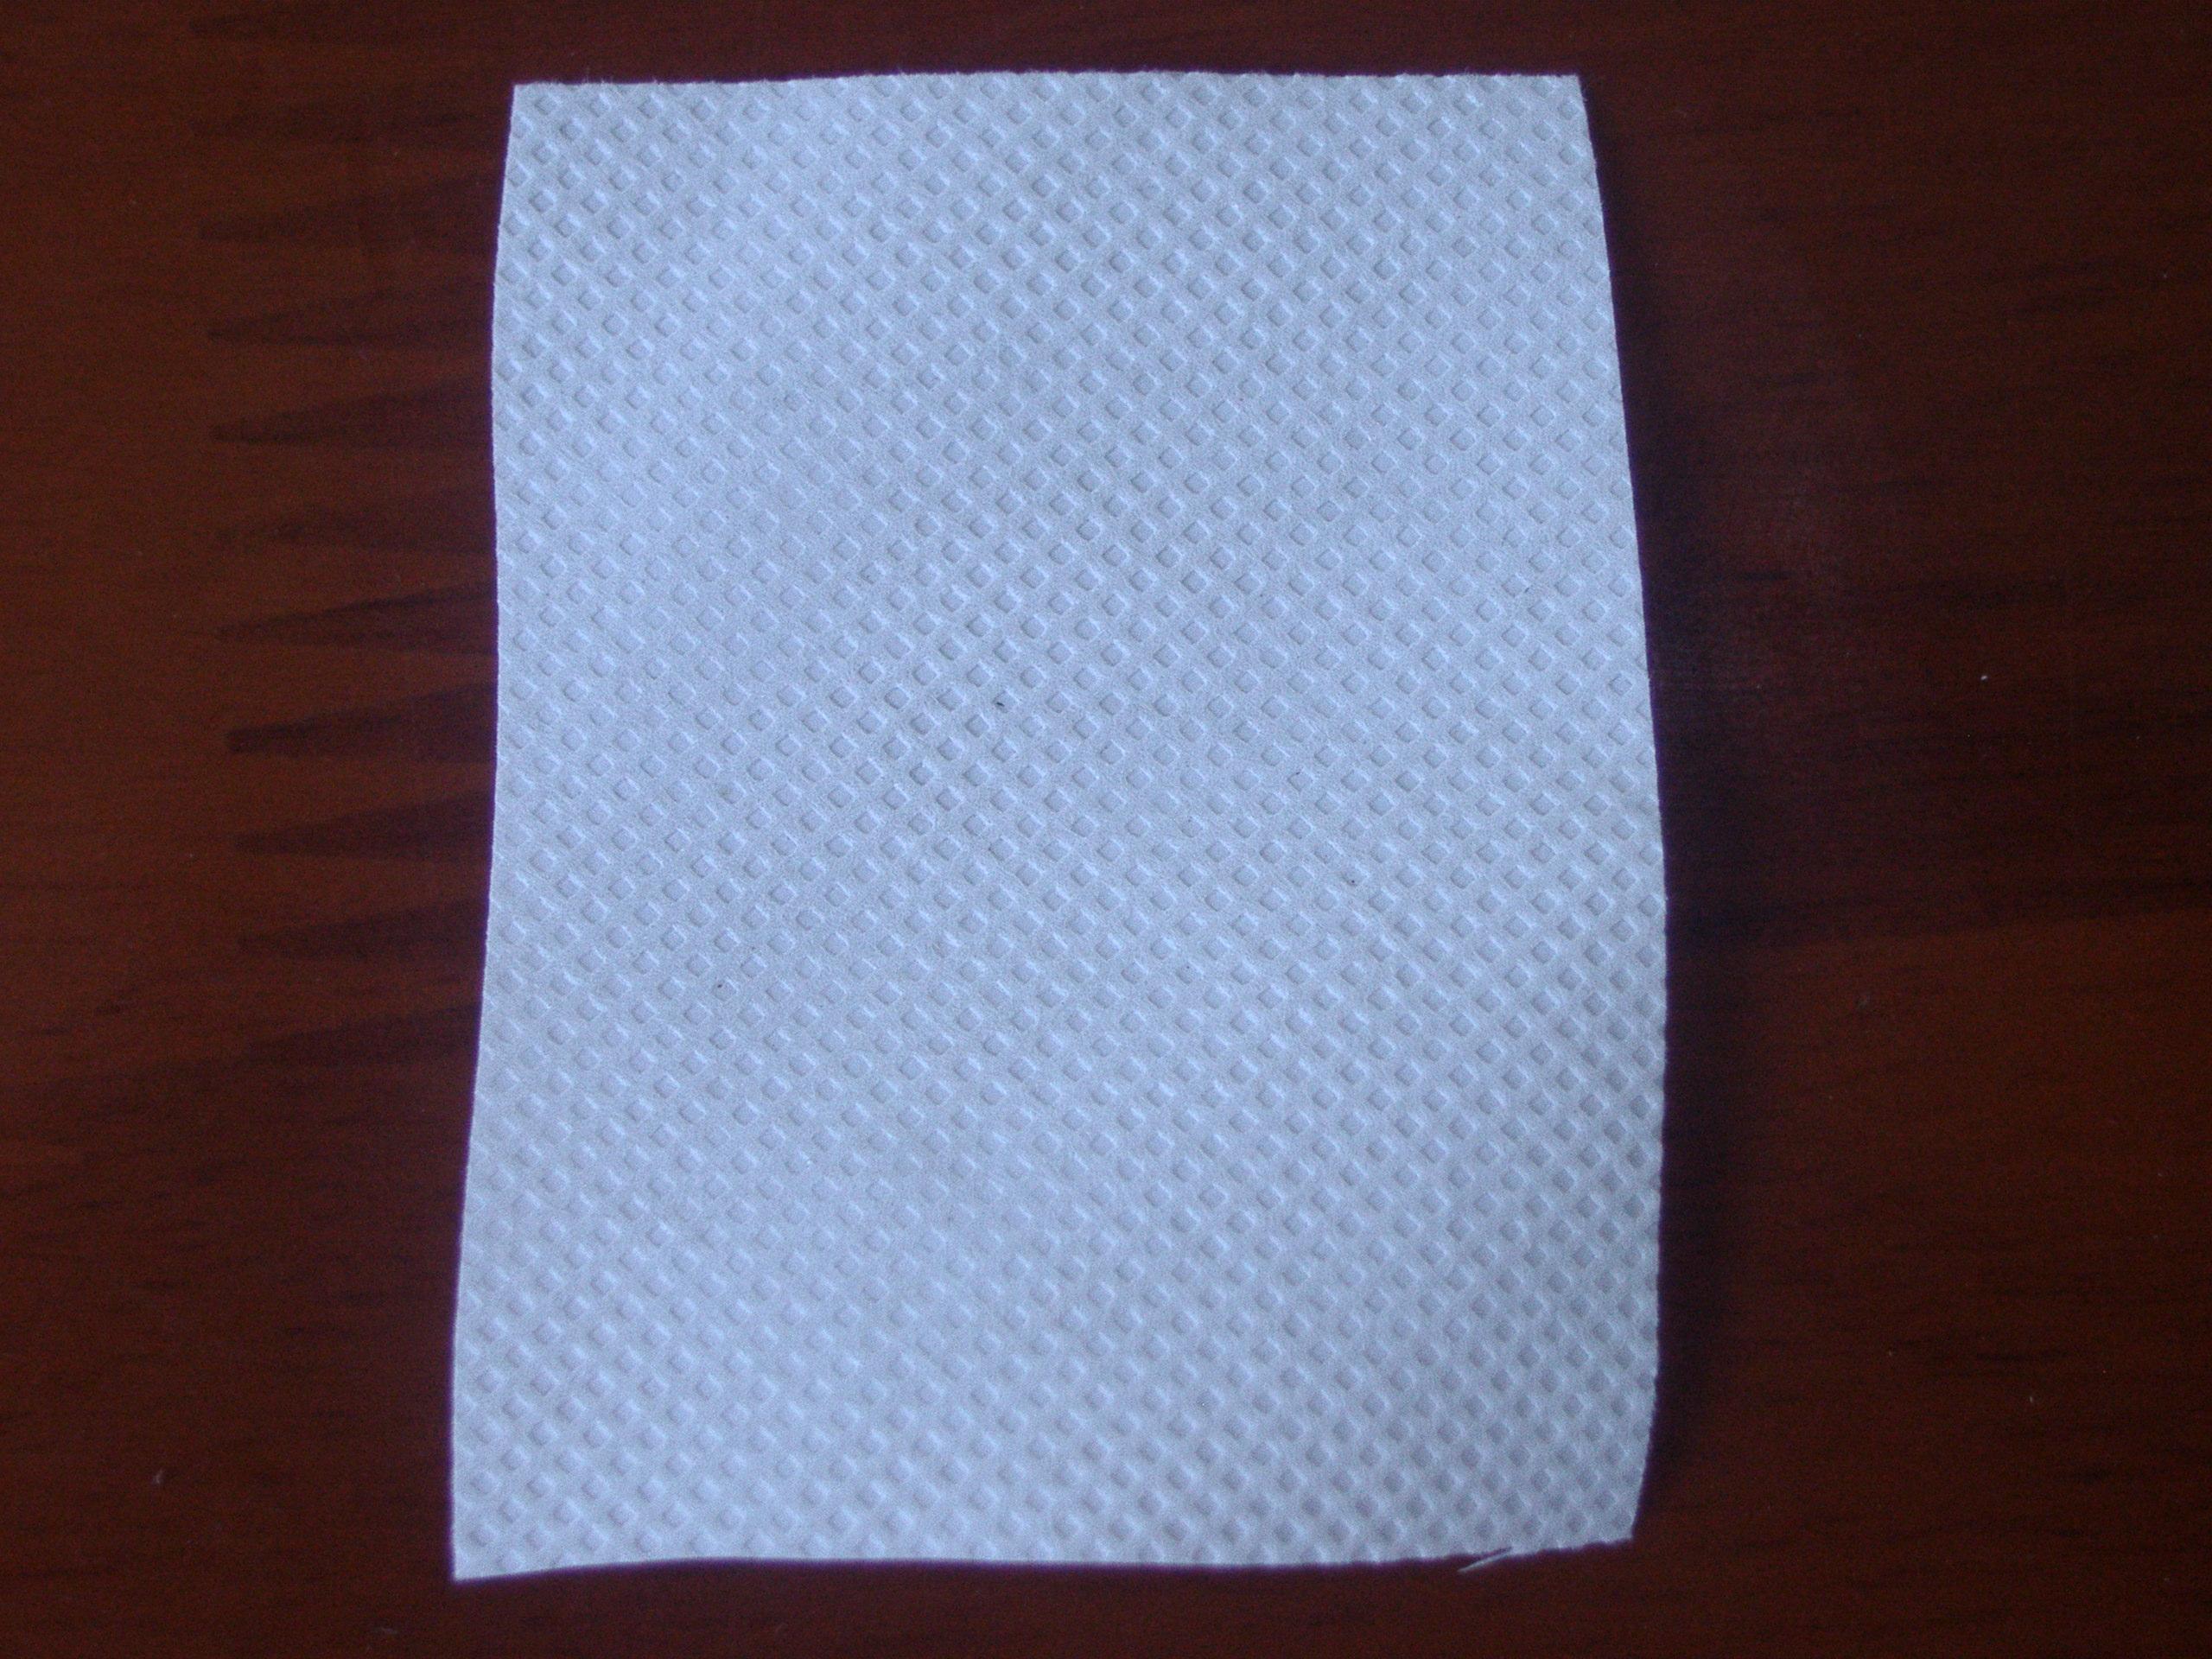 ePTFE Membrane for Medical Application